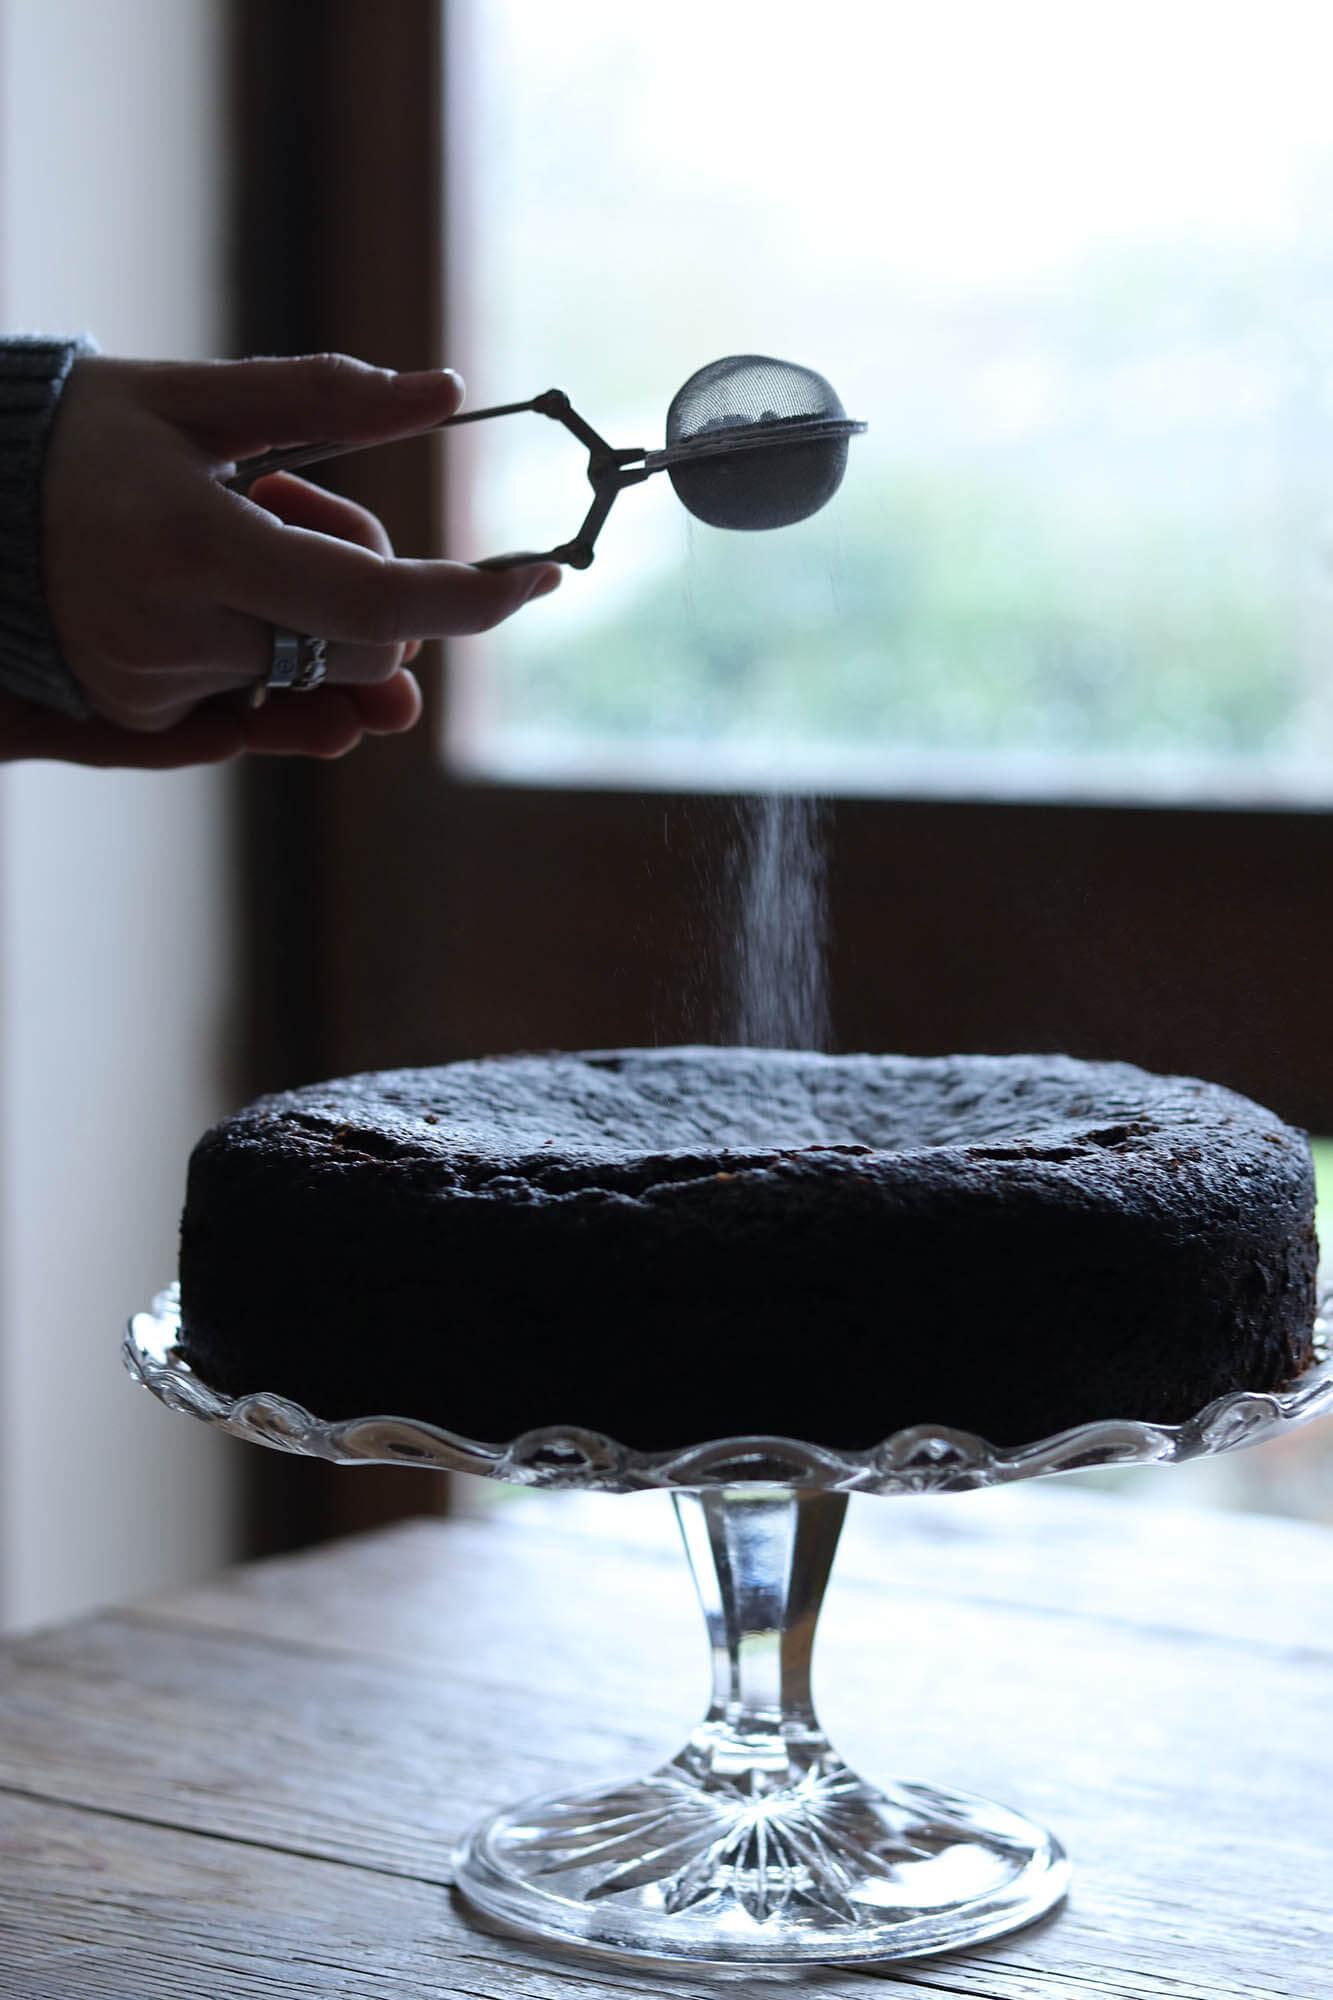 Beast cake getting a dusting of icing sugar